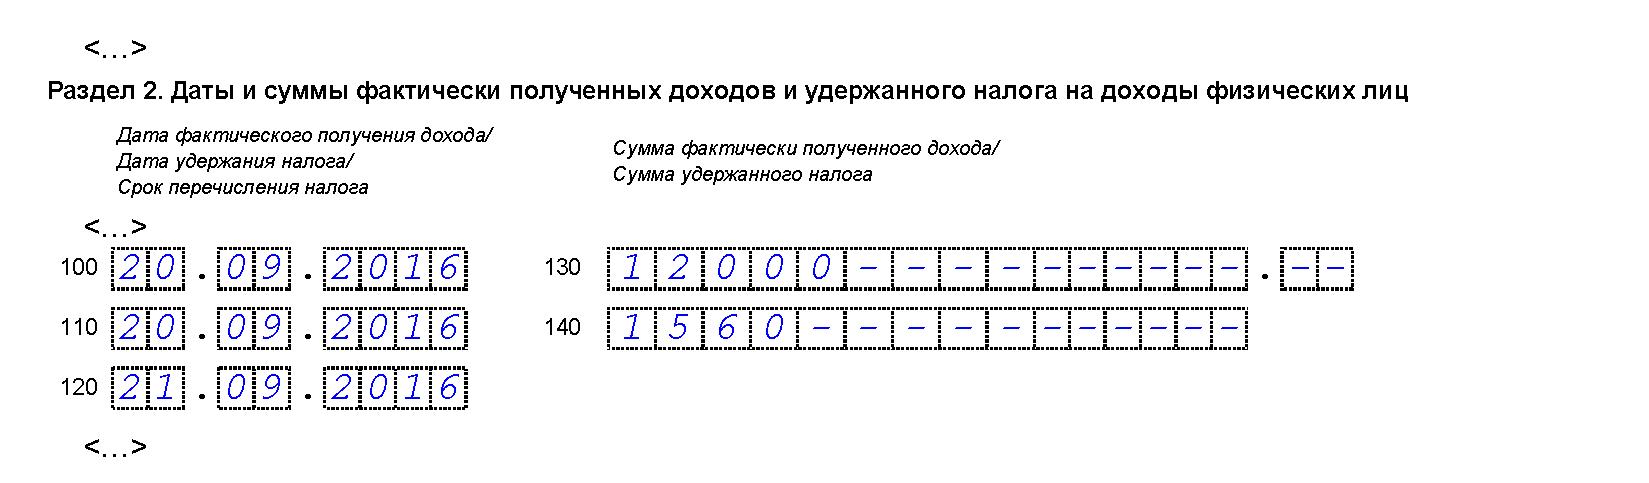 Договор ГПХ в 6-НДФЛ за 3 квартал